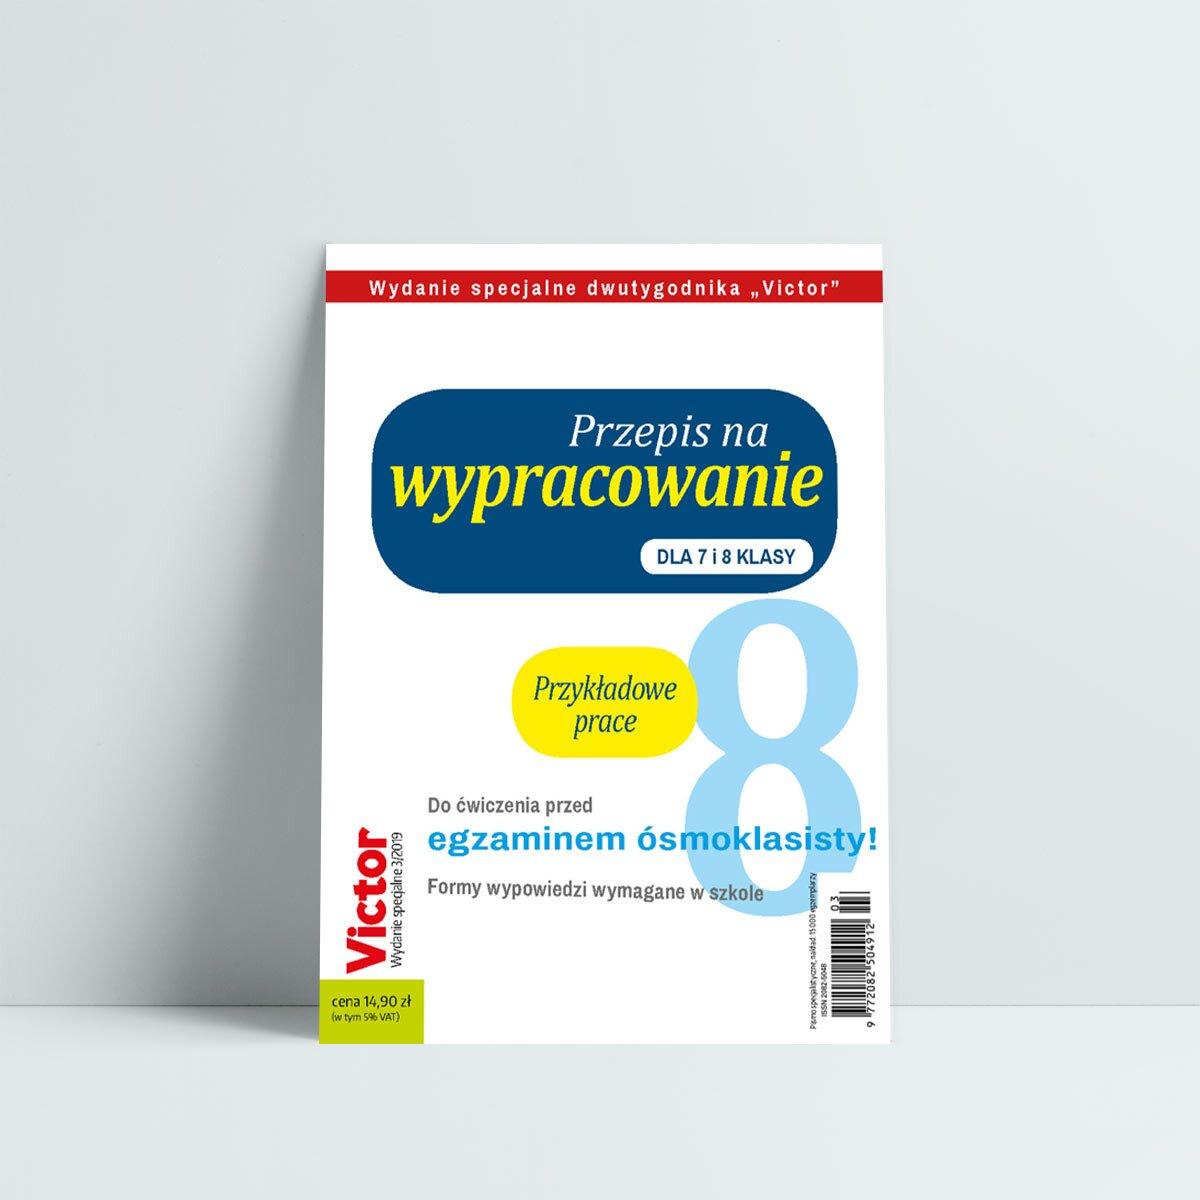 victor_dod_wypracowanie-product-image